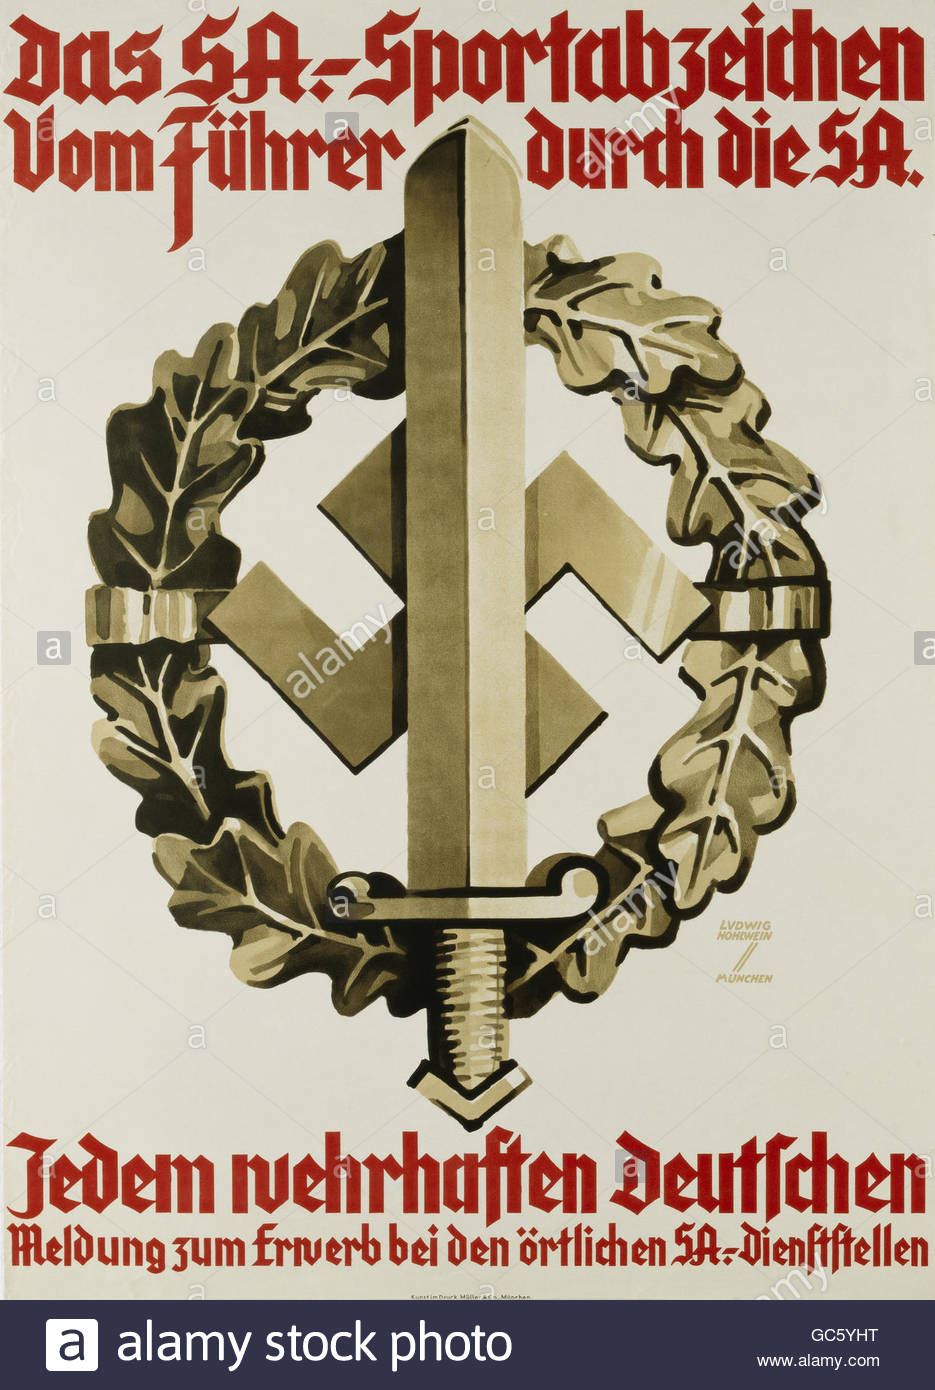 Nazism, National Socialism, organisations, Sturmabteilung (SA), poster 'Das SA-Sportabzeichen' (The SA Sports - Stock Image